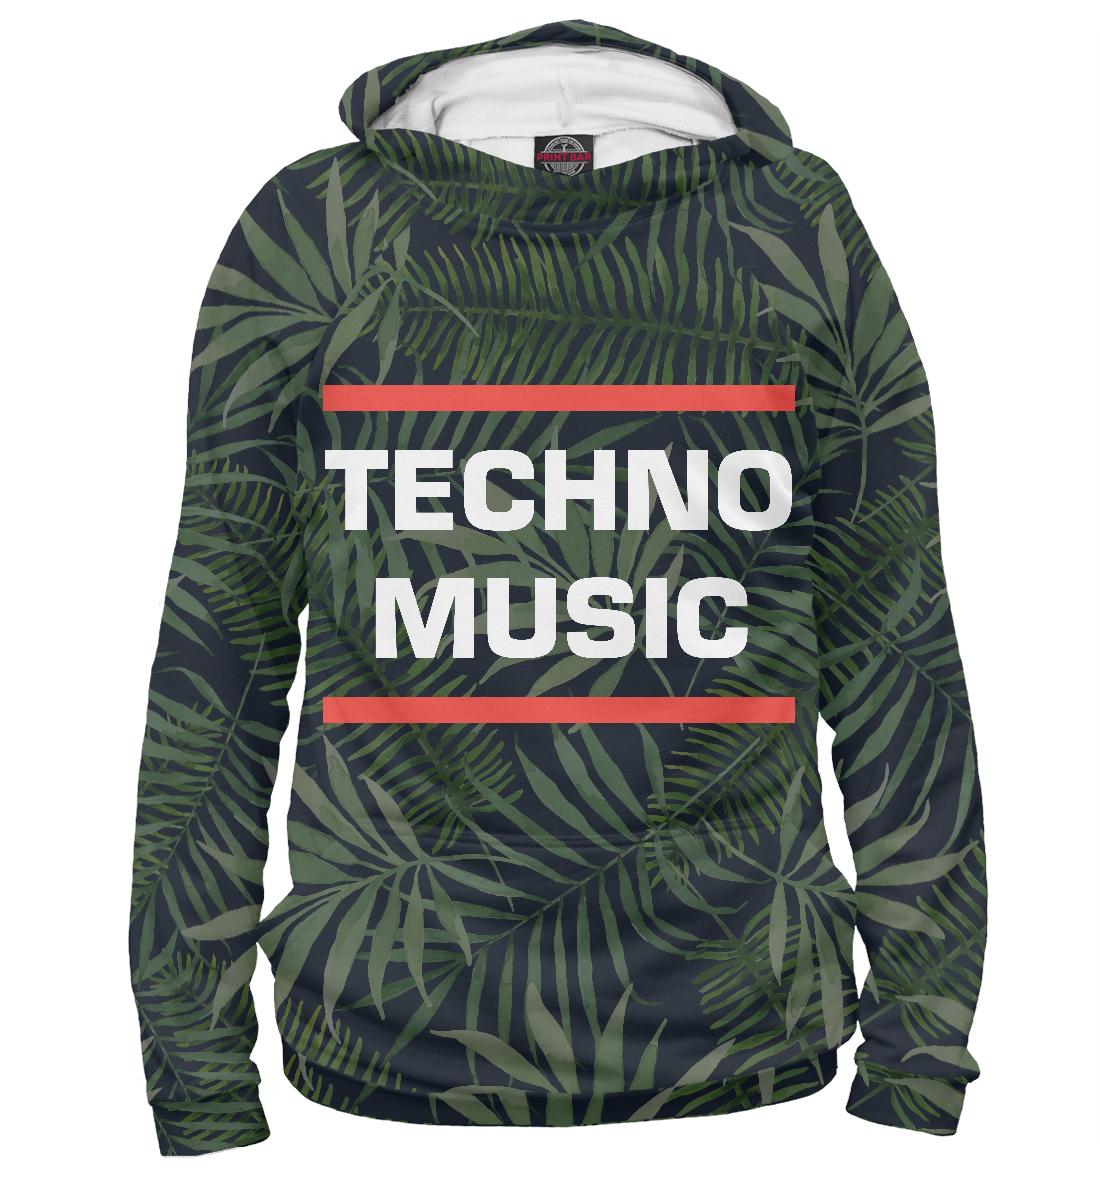 Купить Techno music, Printbar, Худи, DJS-313981-hud-2